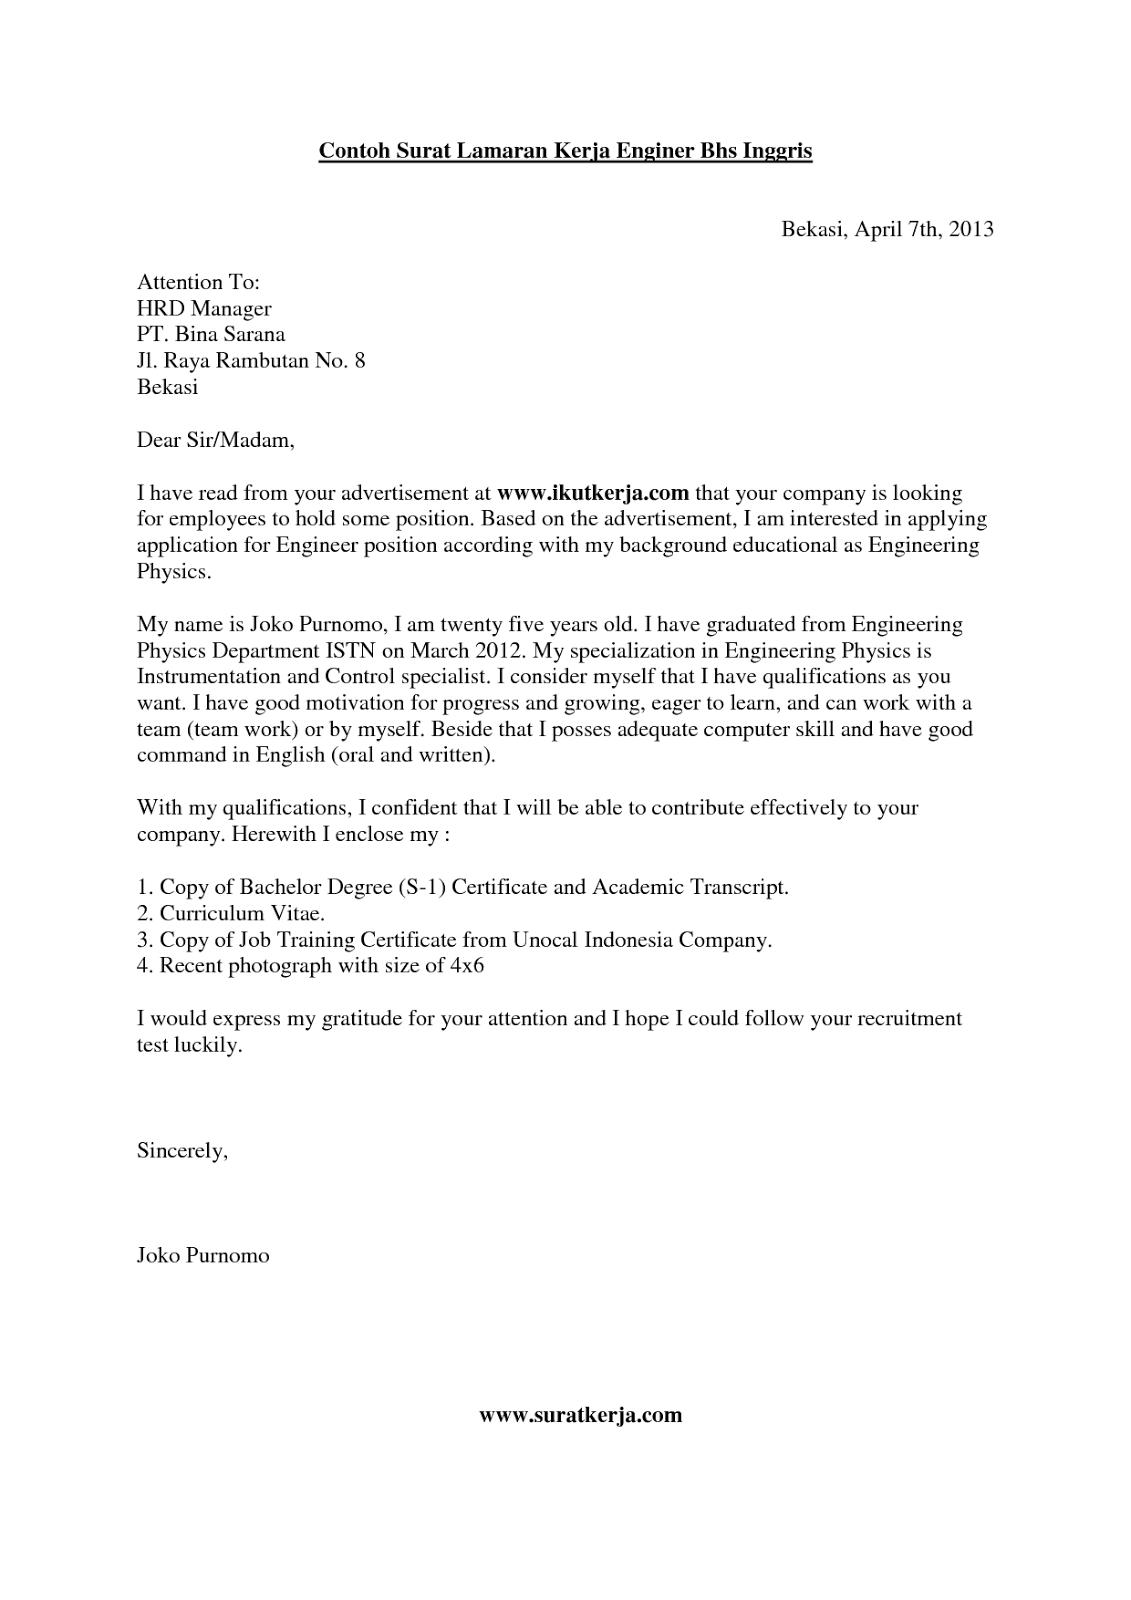 Contoh Surat Lamaran Kerja Dan Cv Dalam Bahasa Inggris Best Resume Examples